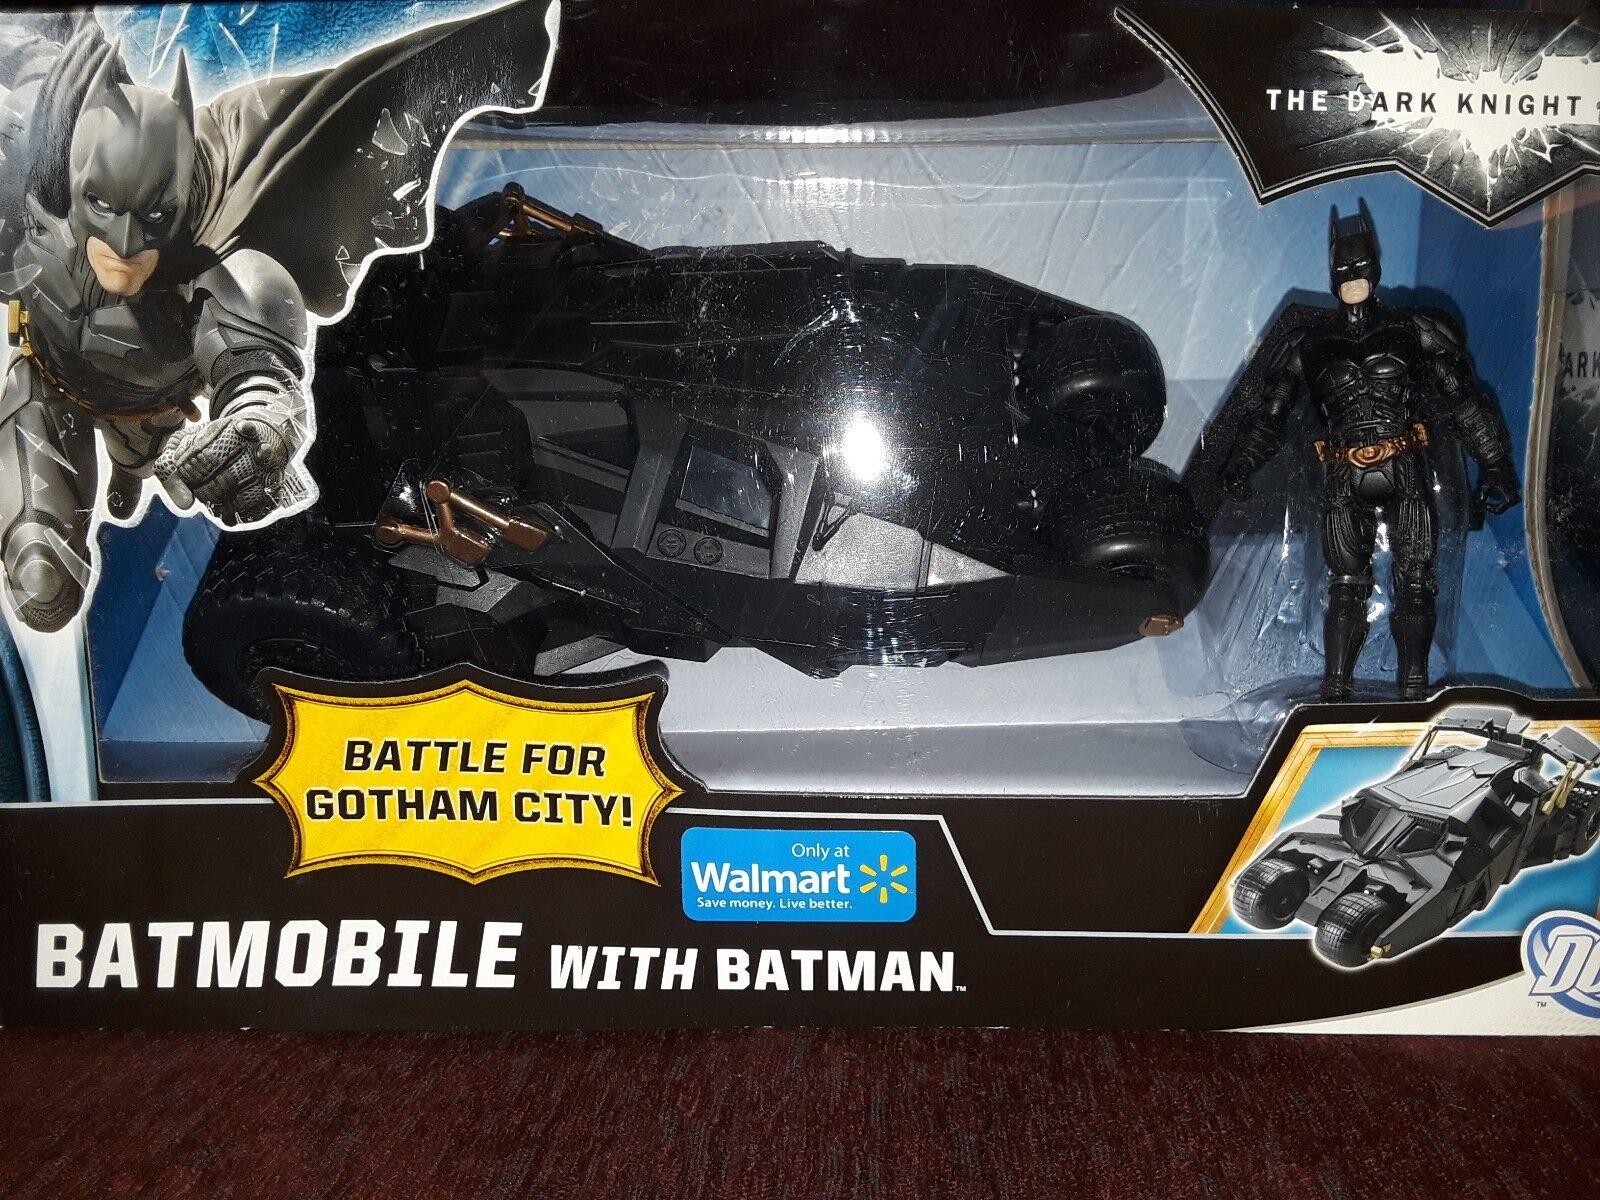 BATMAN MEZCO Mez-Itz DC LOT Dark Dark Dark Knight Tumbler Box Set RARE NEW LEGO MOVIE RARE 343613